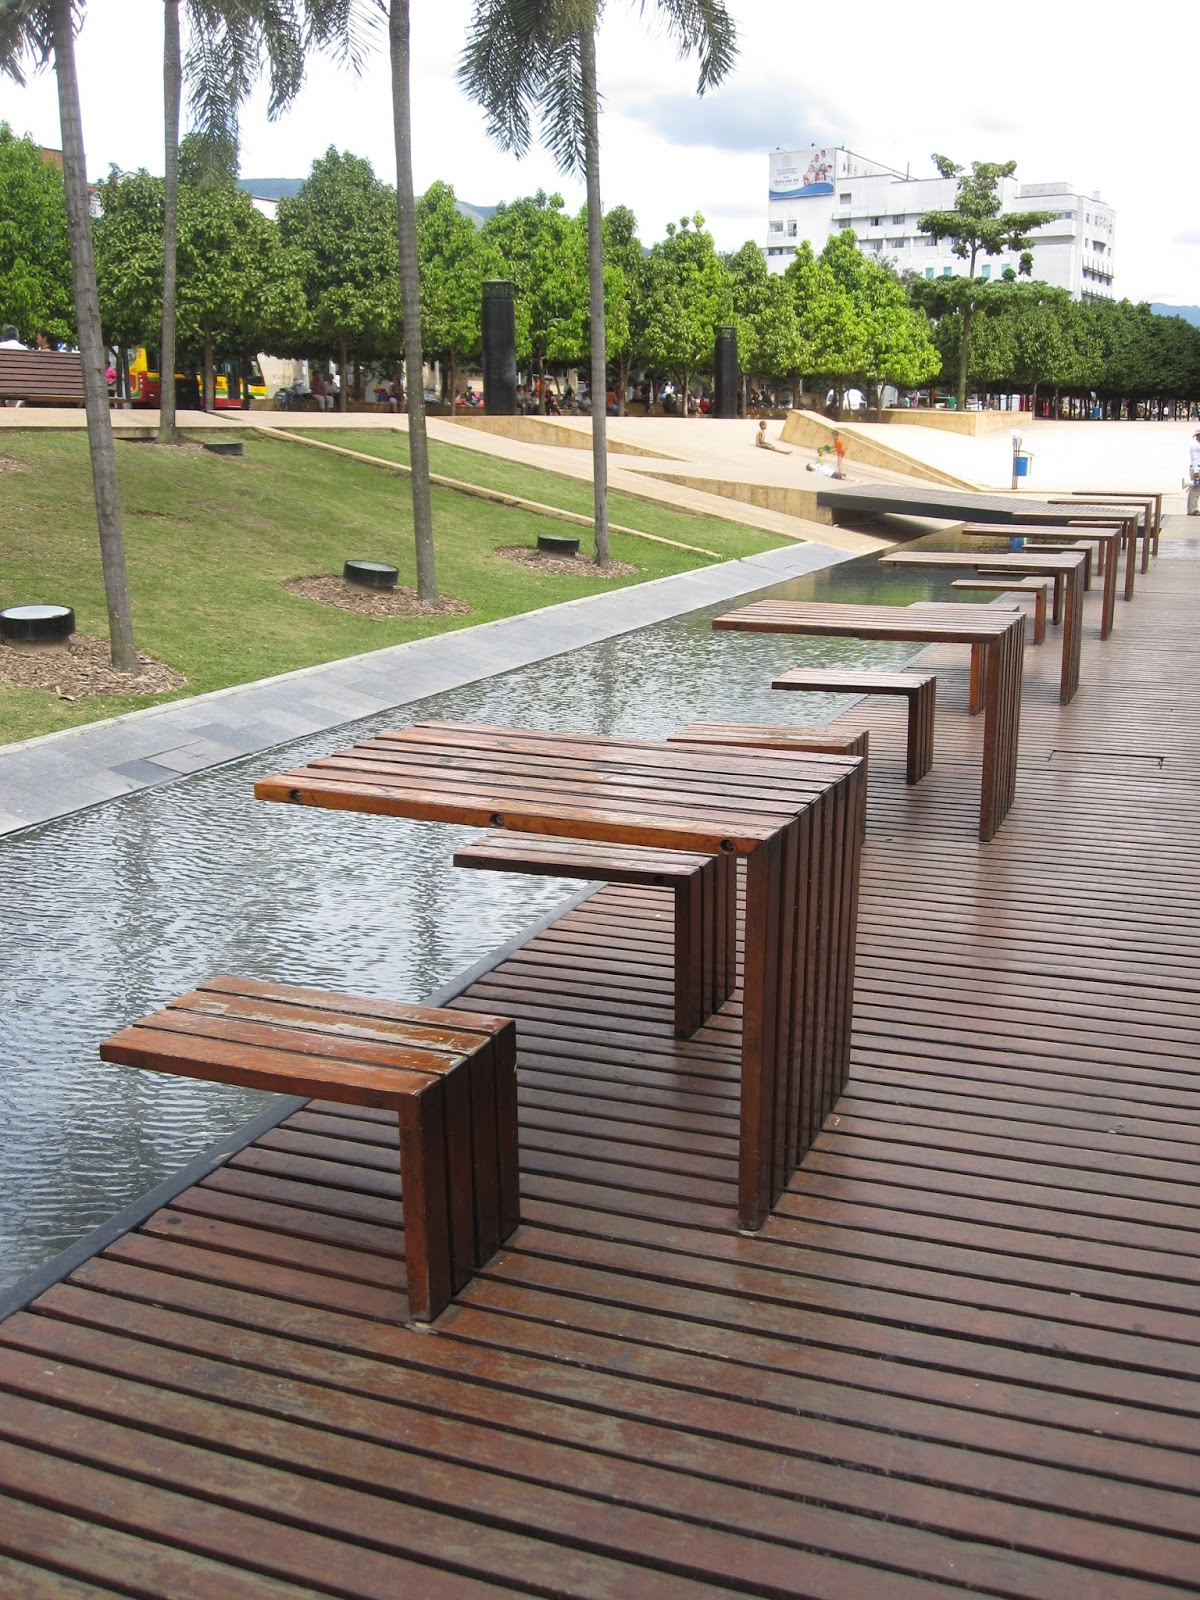 Arquitetura e sustentabilidade medell n for Mobiliario urbano tipos